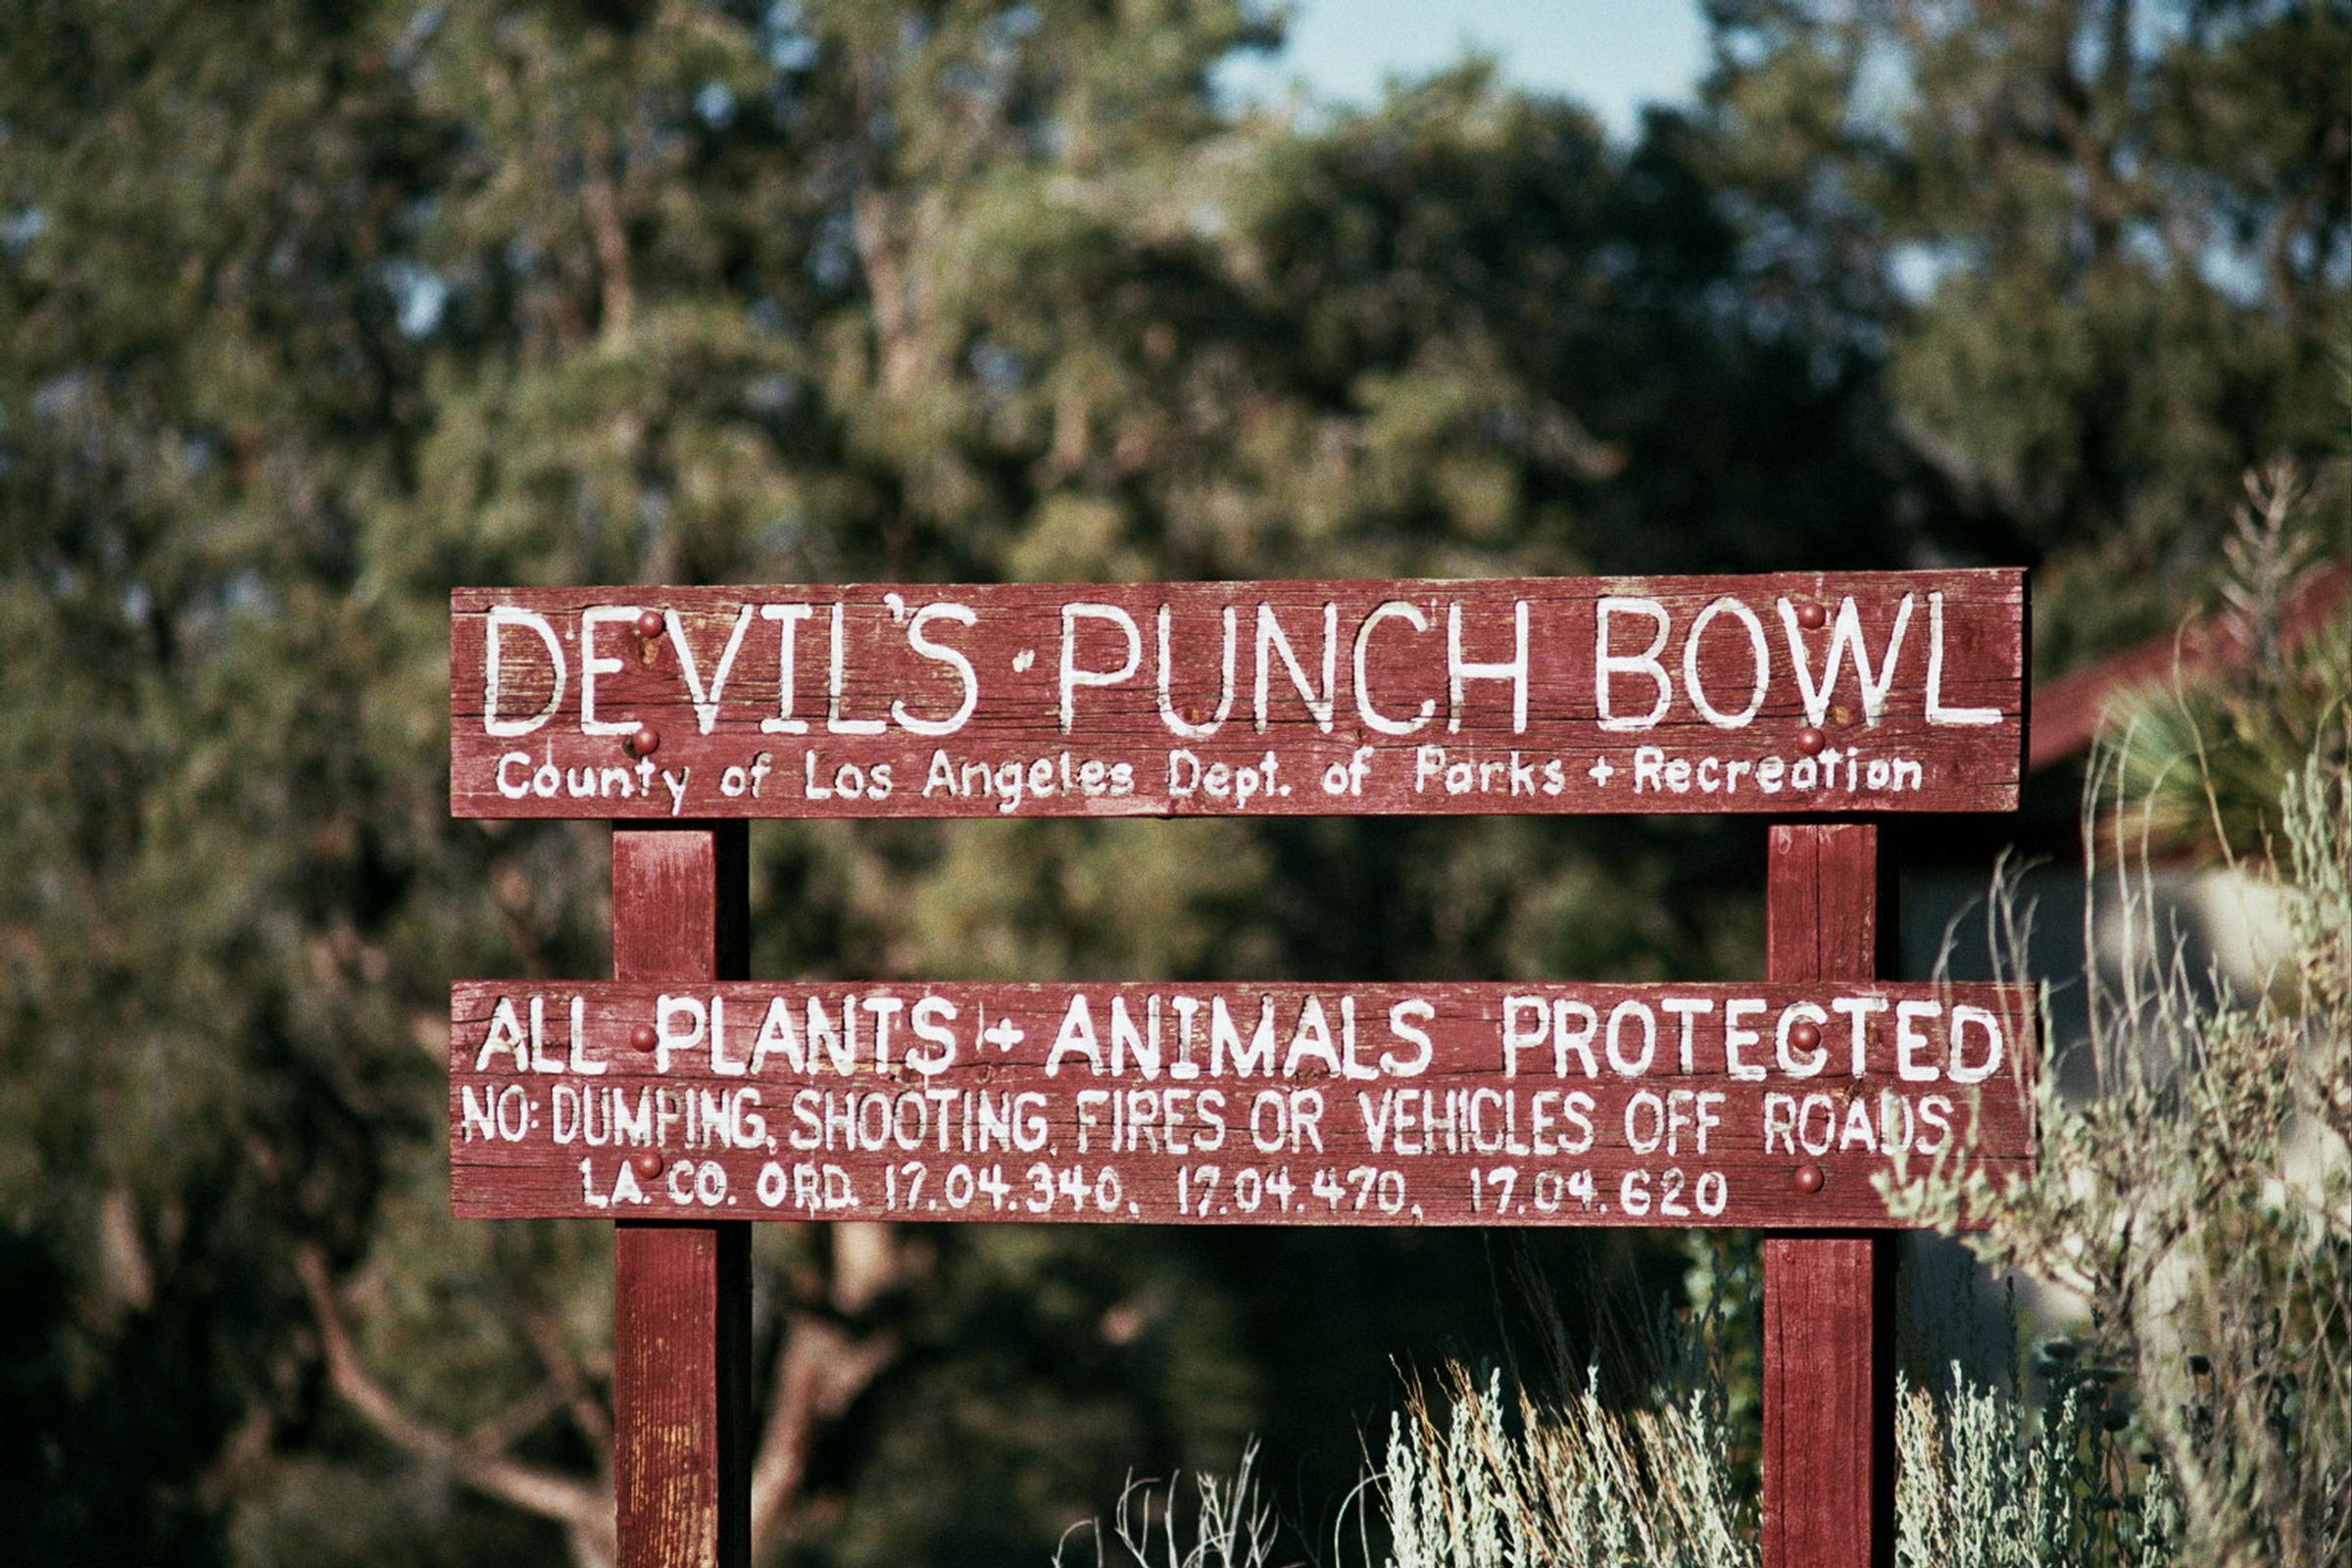 #devil's punch bowl